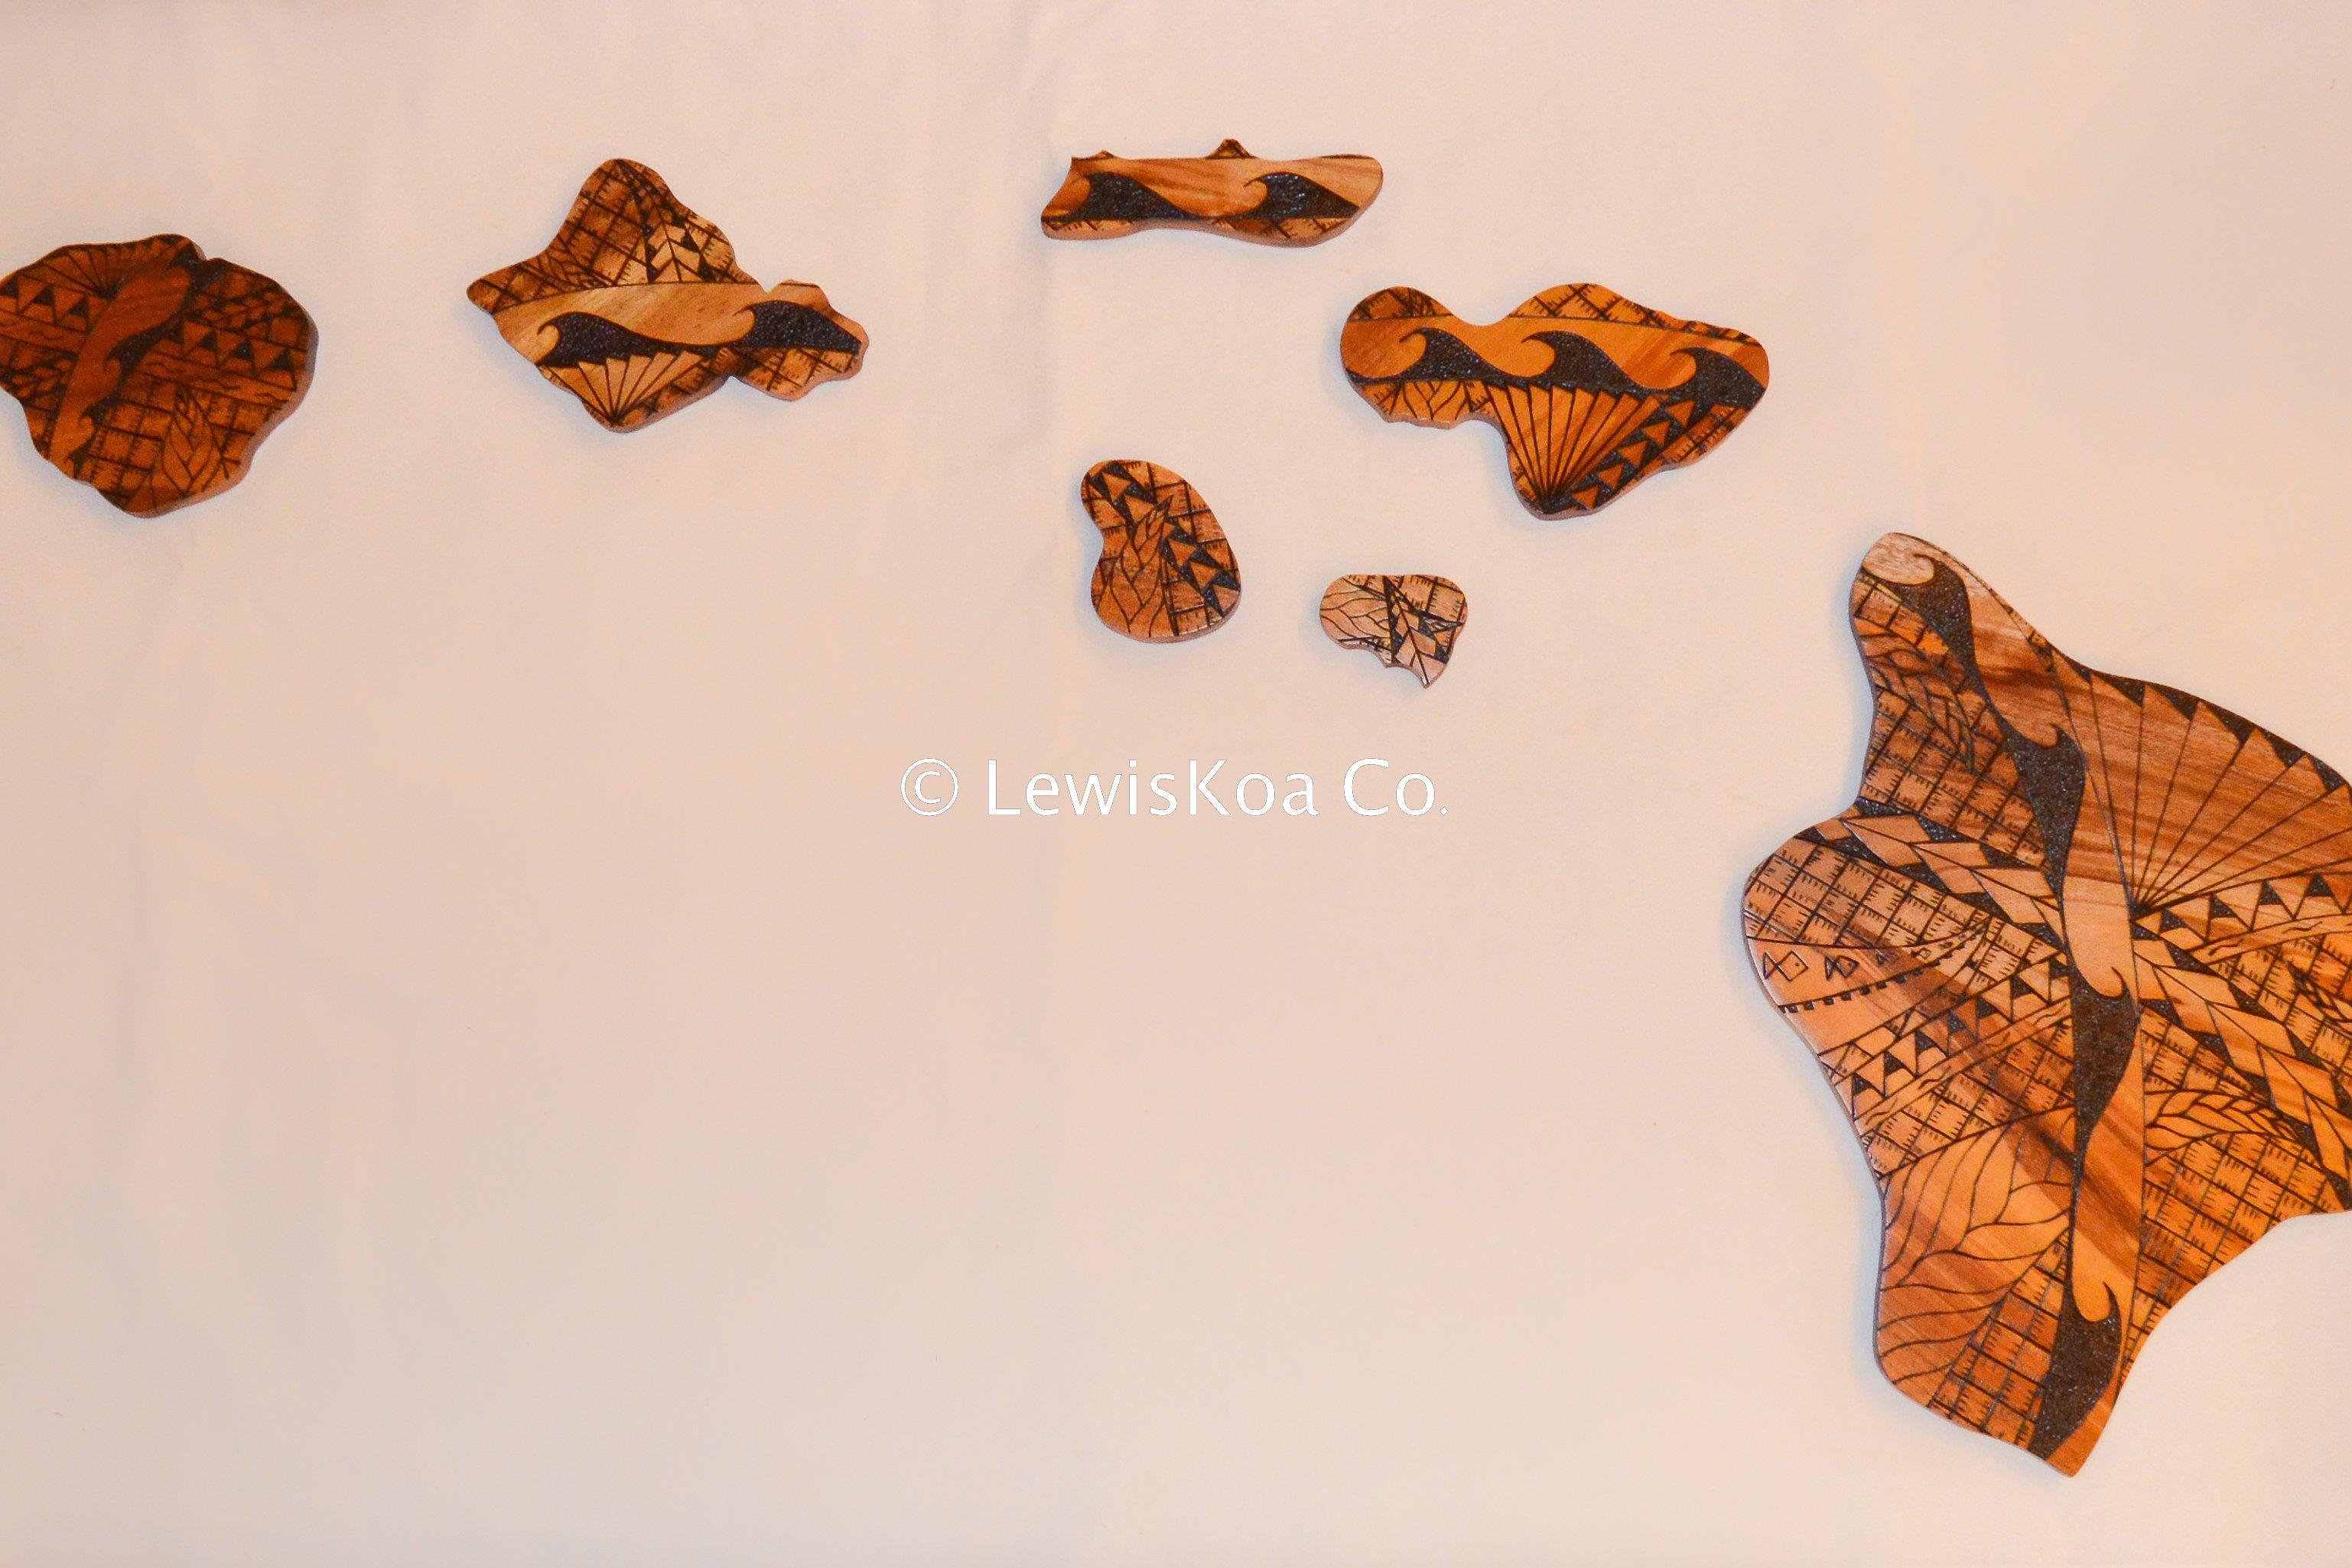 Lewiskoa Co (Image 10 of 20)